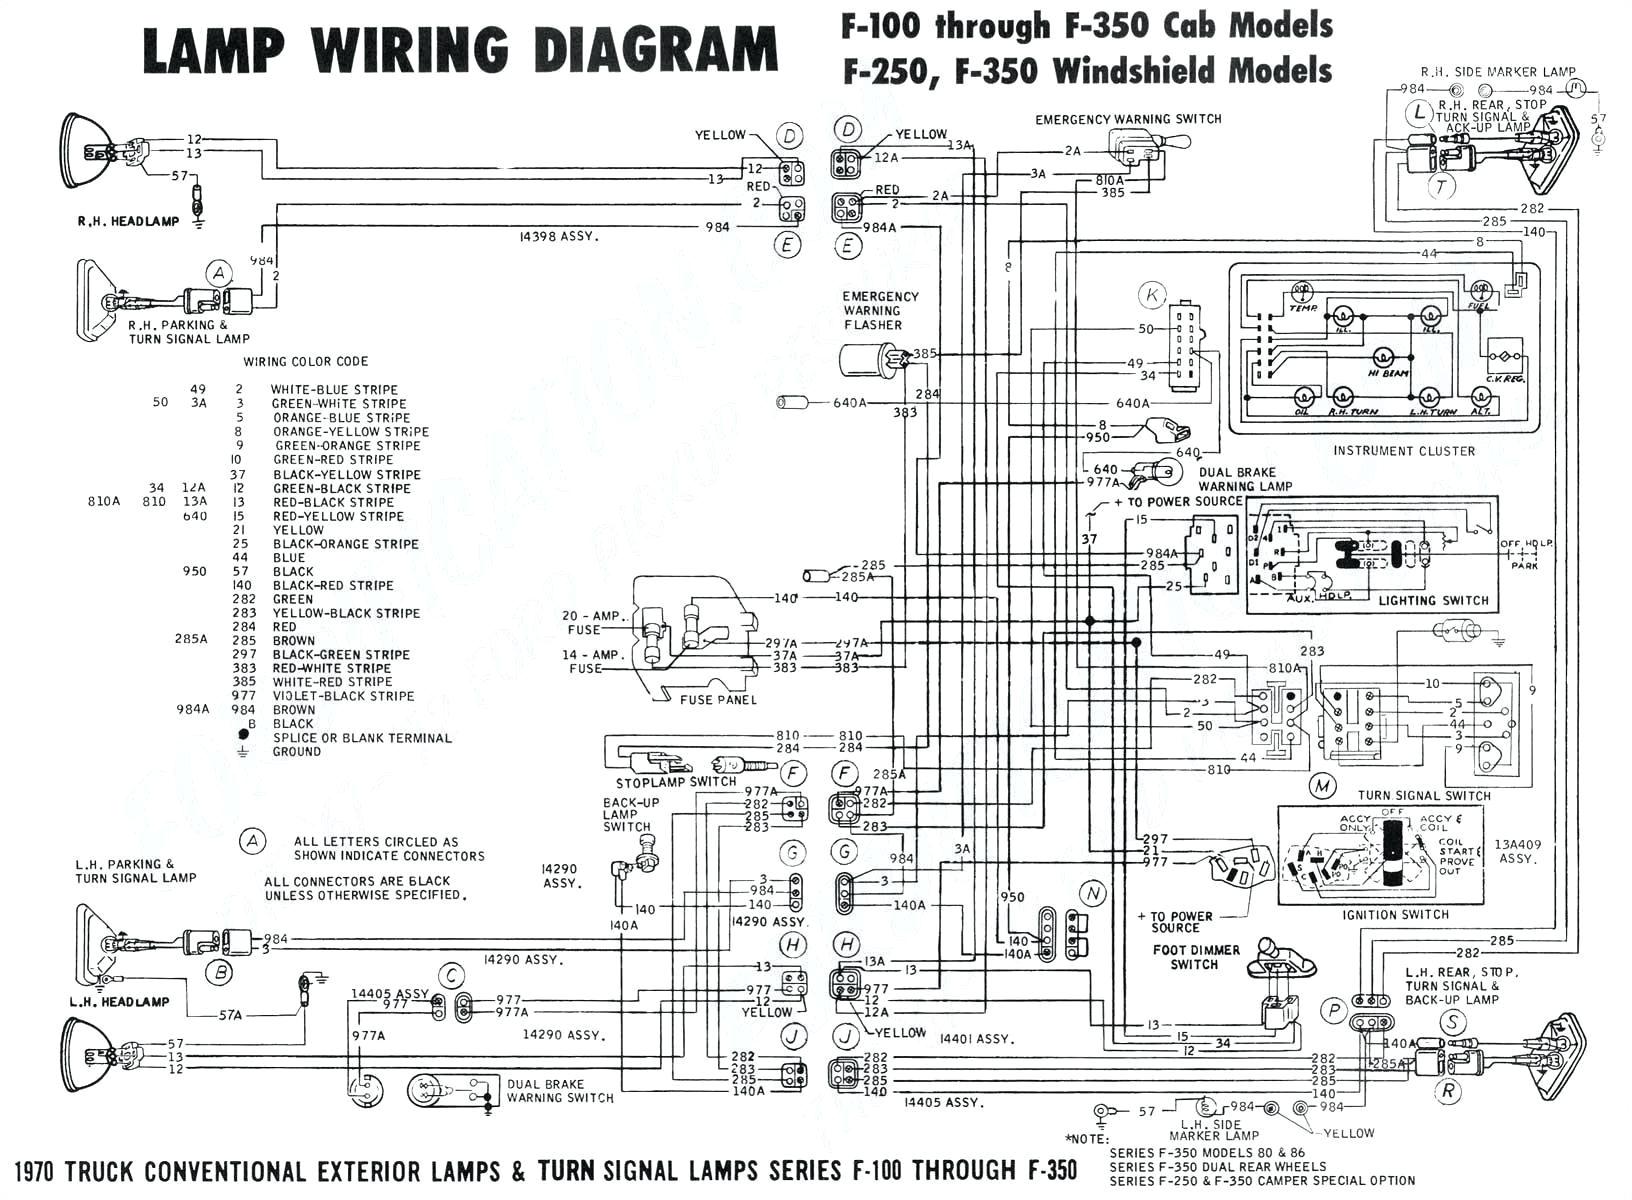 block diagram of defibrillator new wiring diagram chrysler diagrams 75 105 hp izkbliofem e280a2 jpg